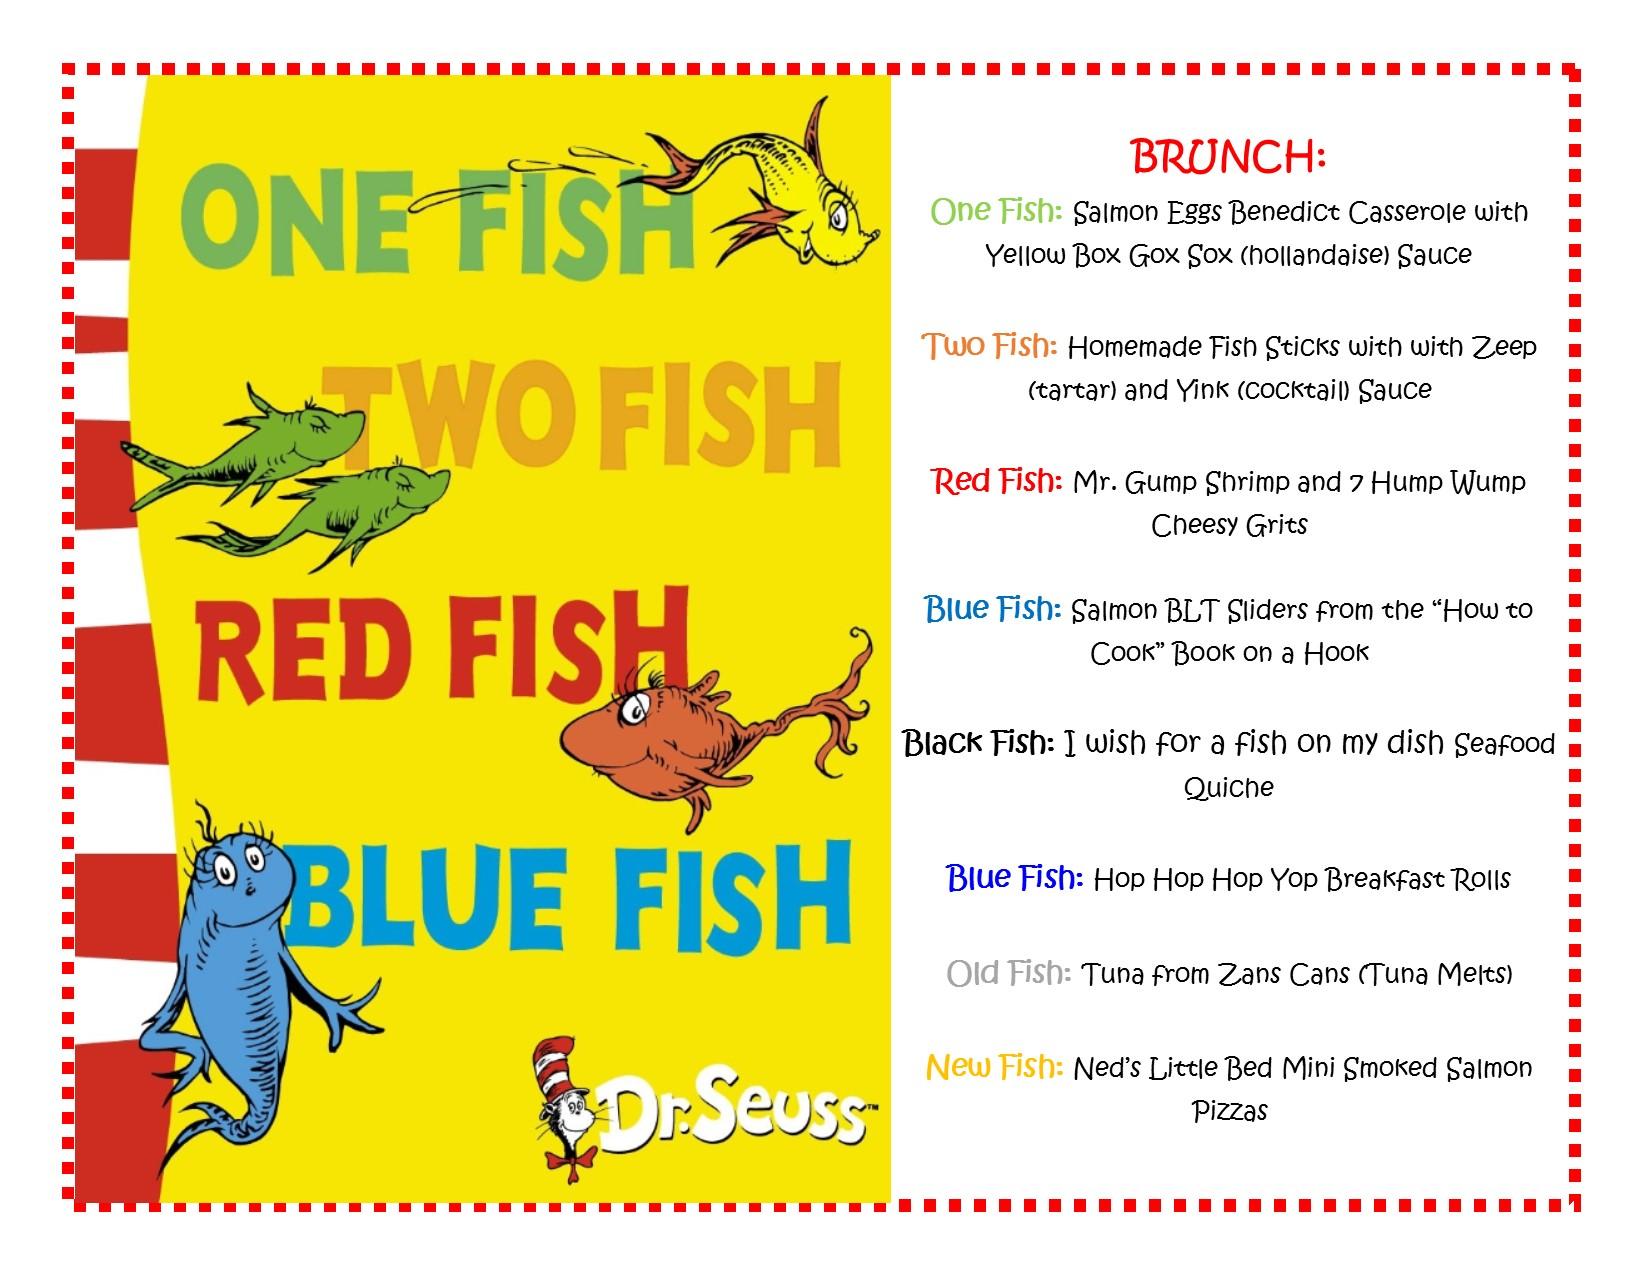 Dr Suess Red Fish Blue Fish Menu.jpg